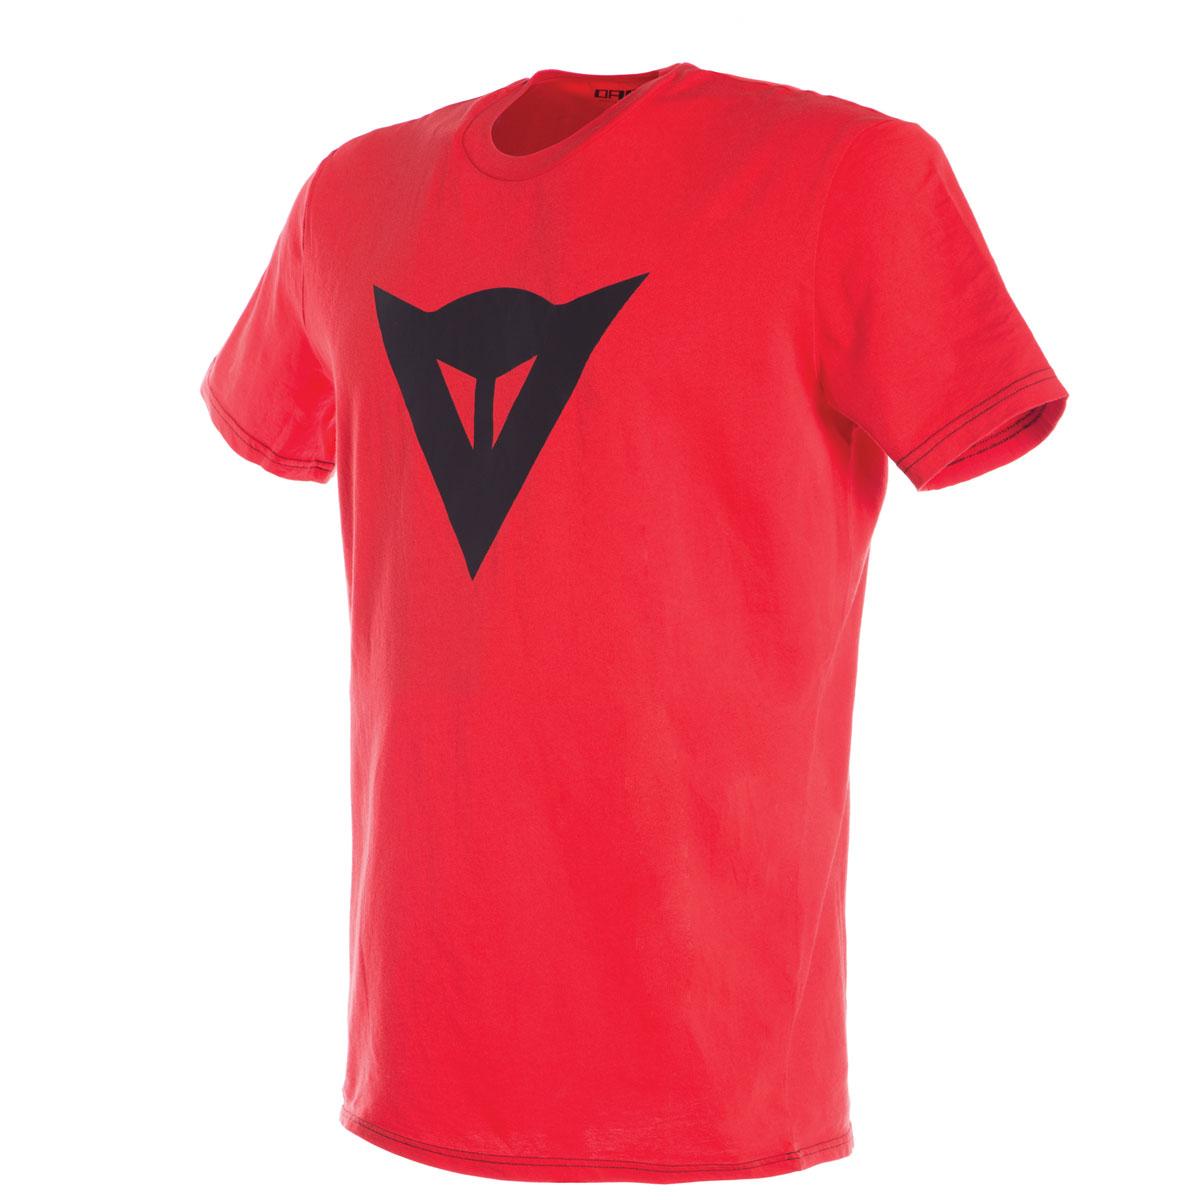 Dainese Men's Speed Demon Red T-Shirt